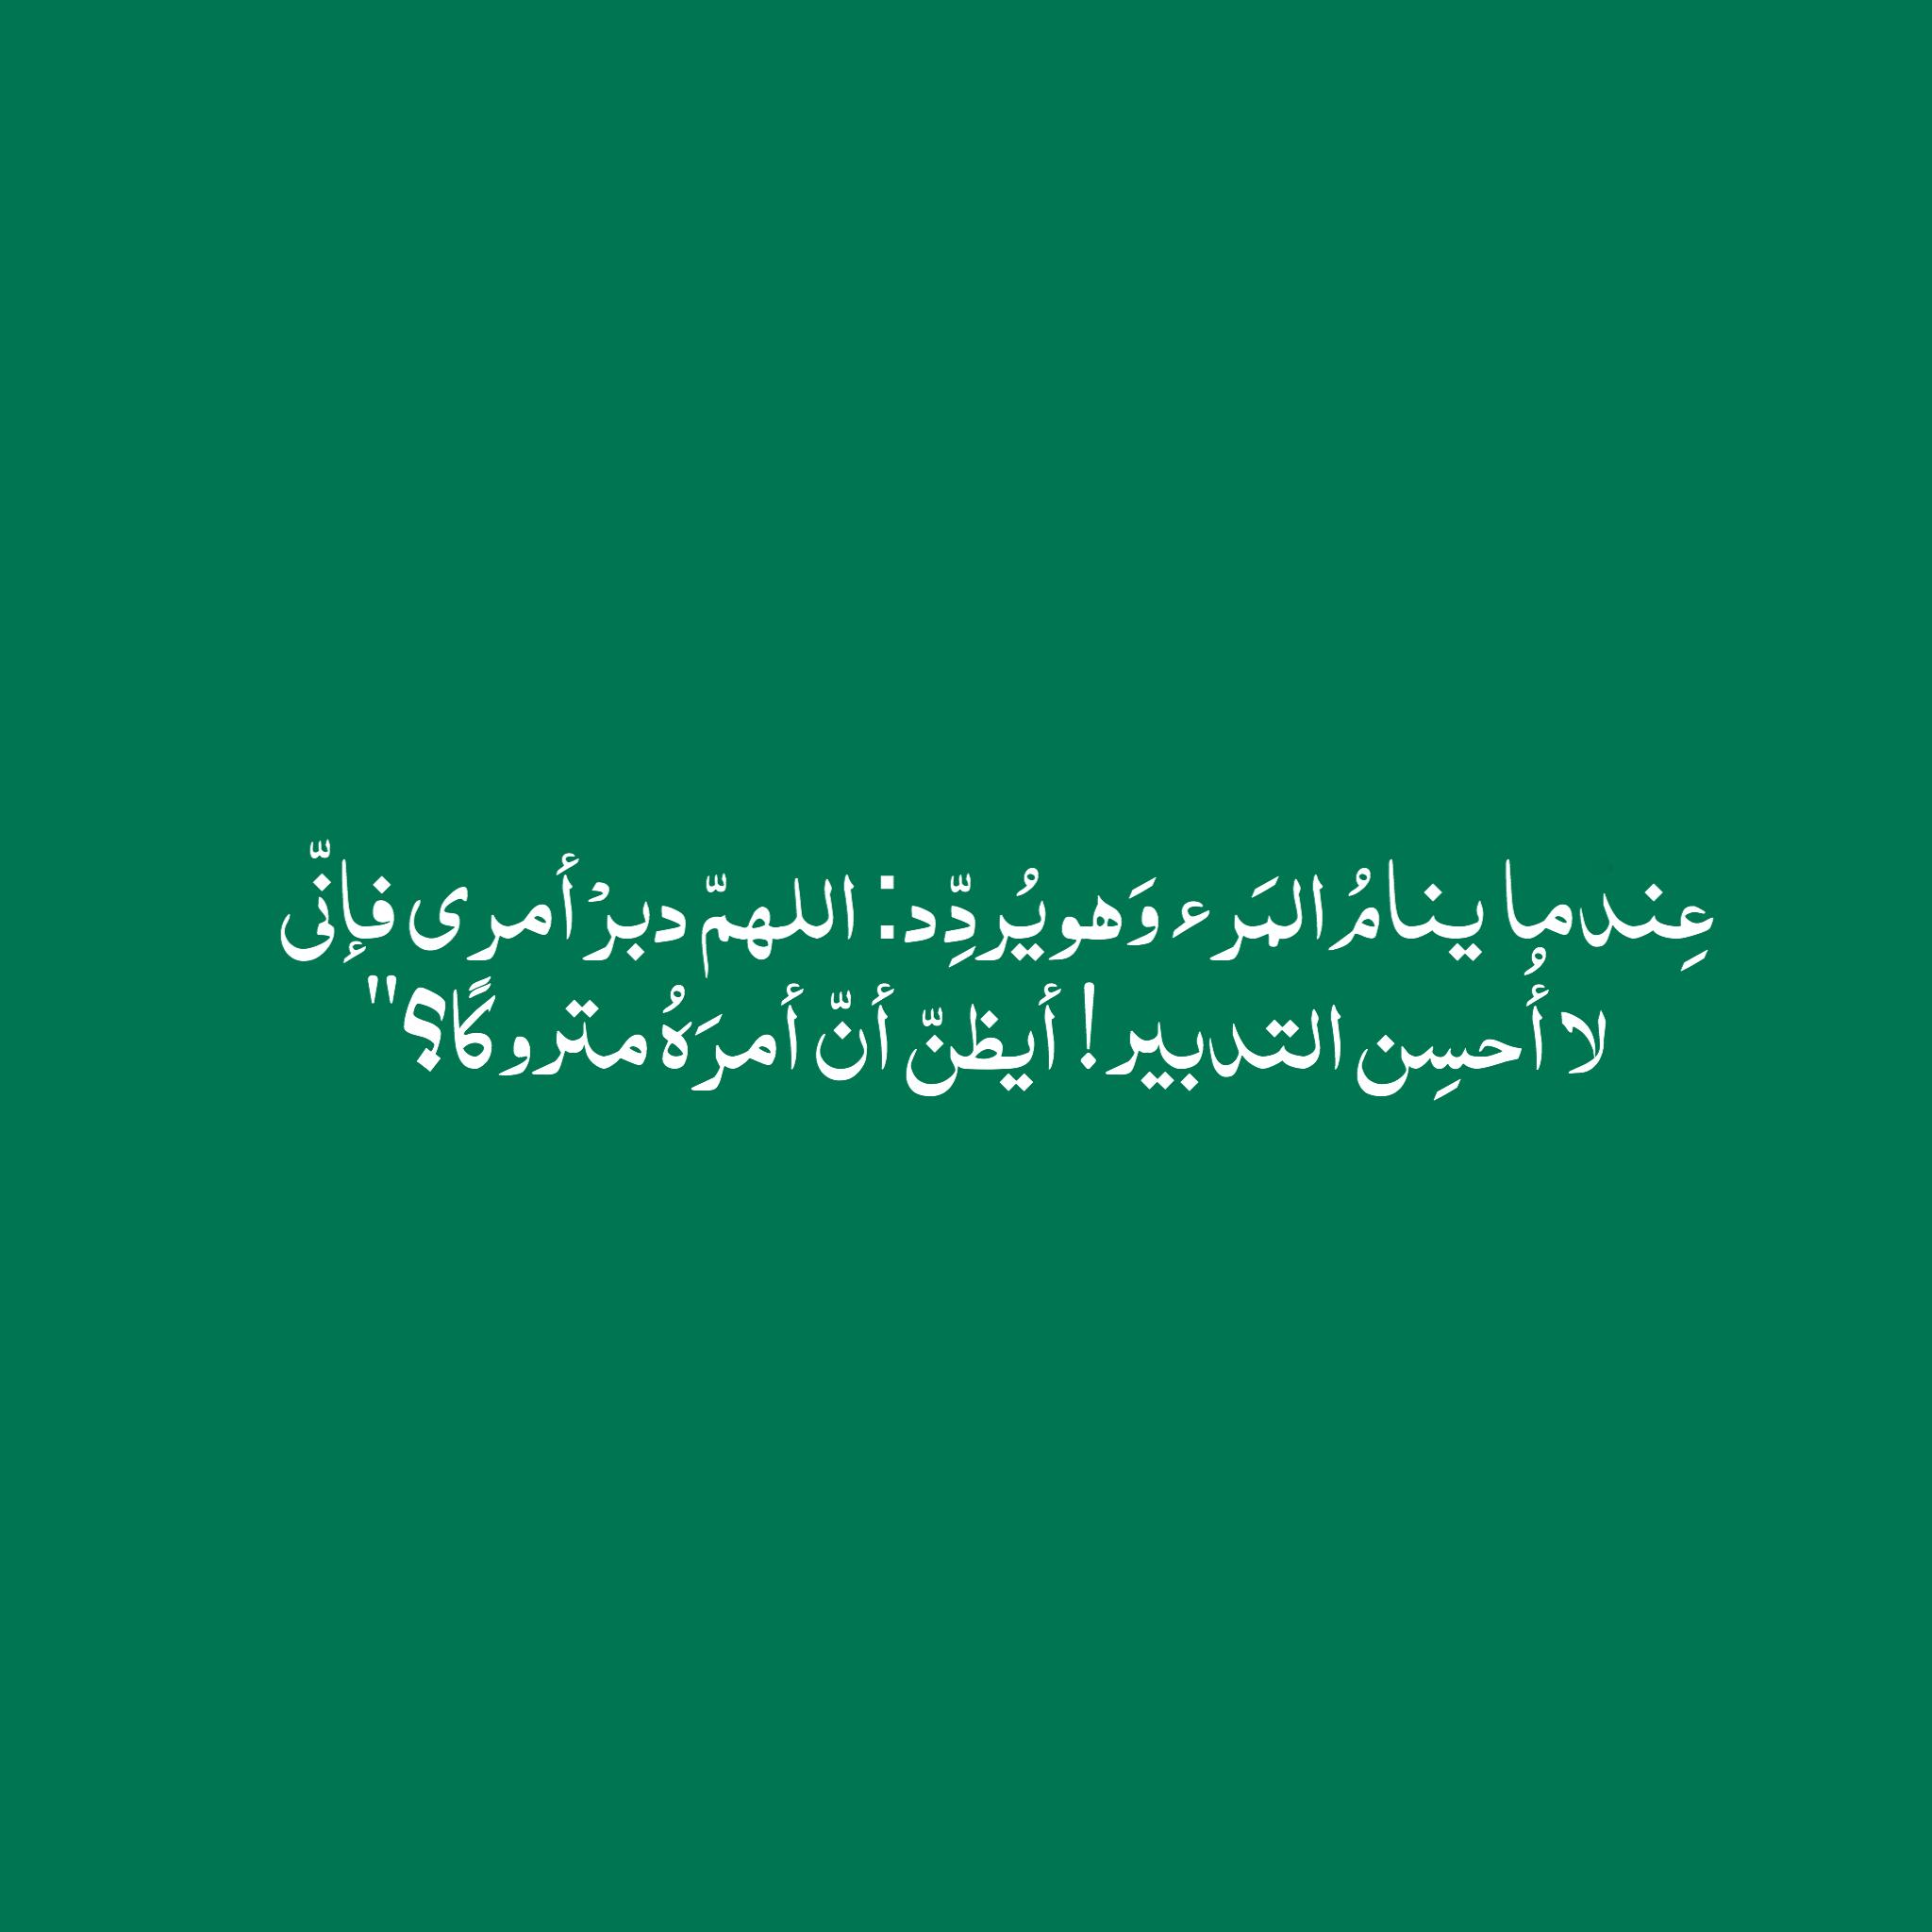 Instagram Msmo Islamic Inspirational Quotes Inspirational Quotes Islamic Quotes